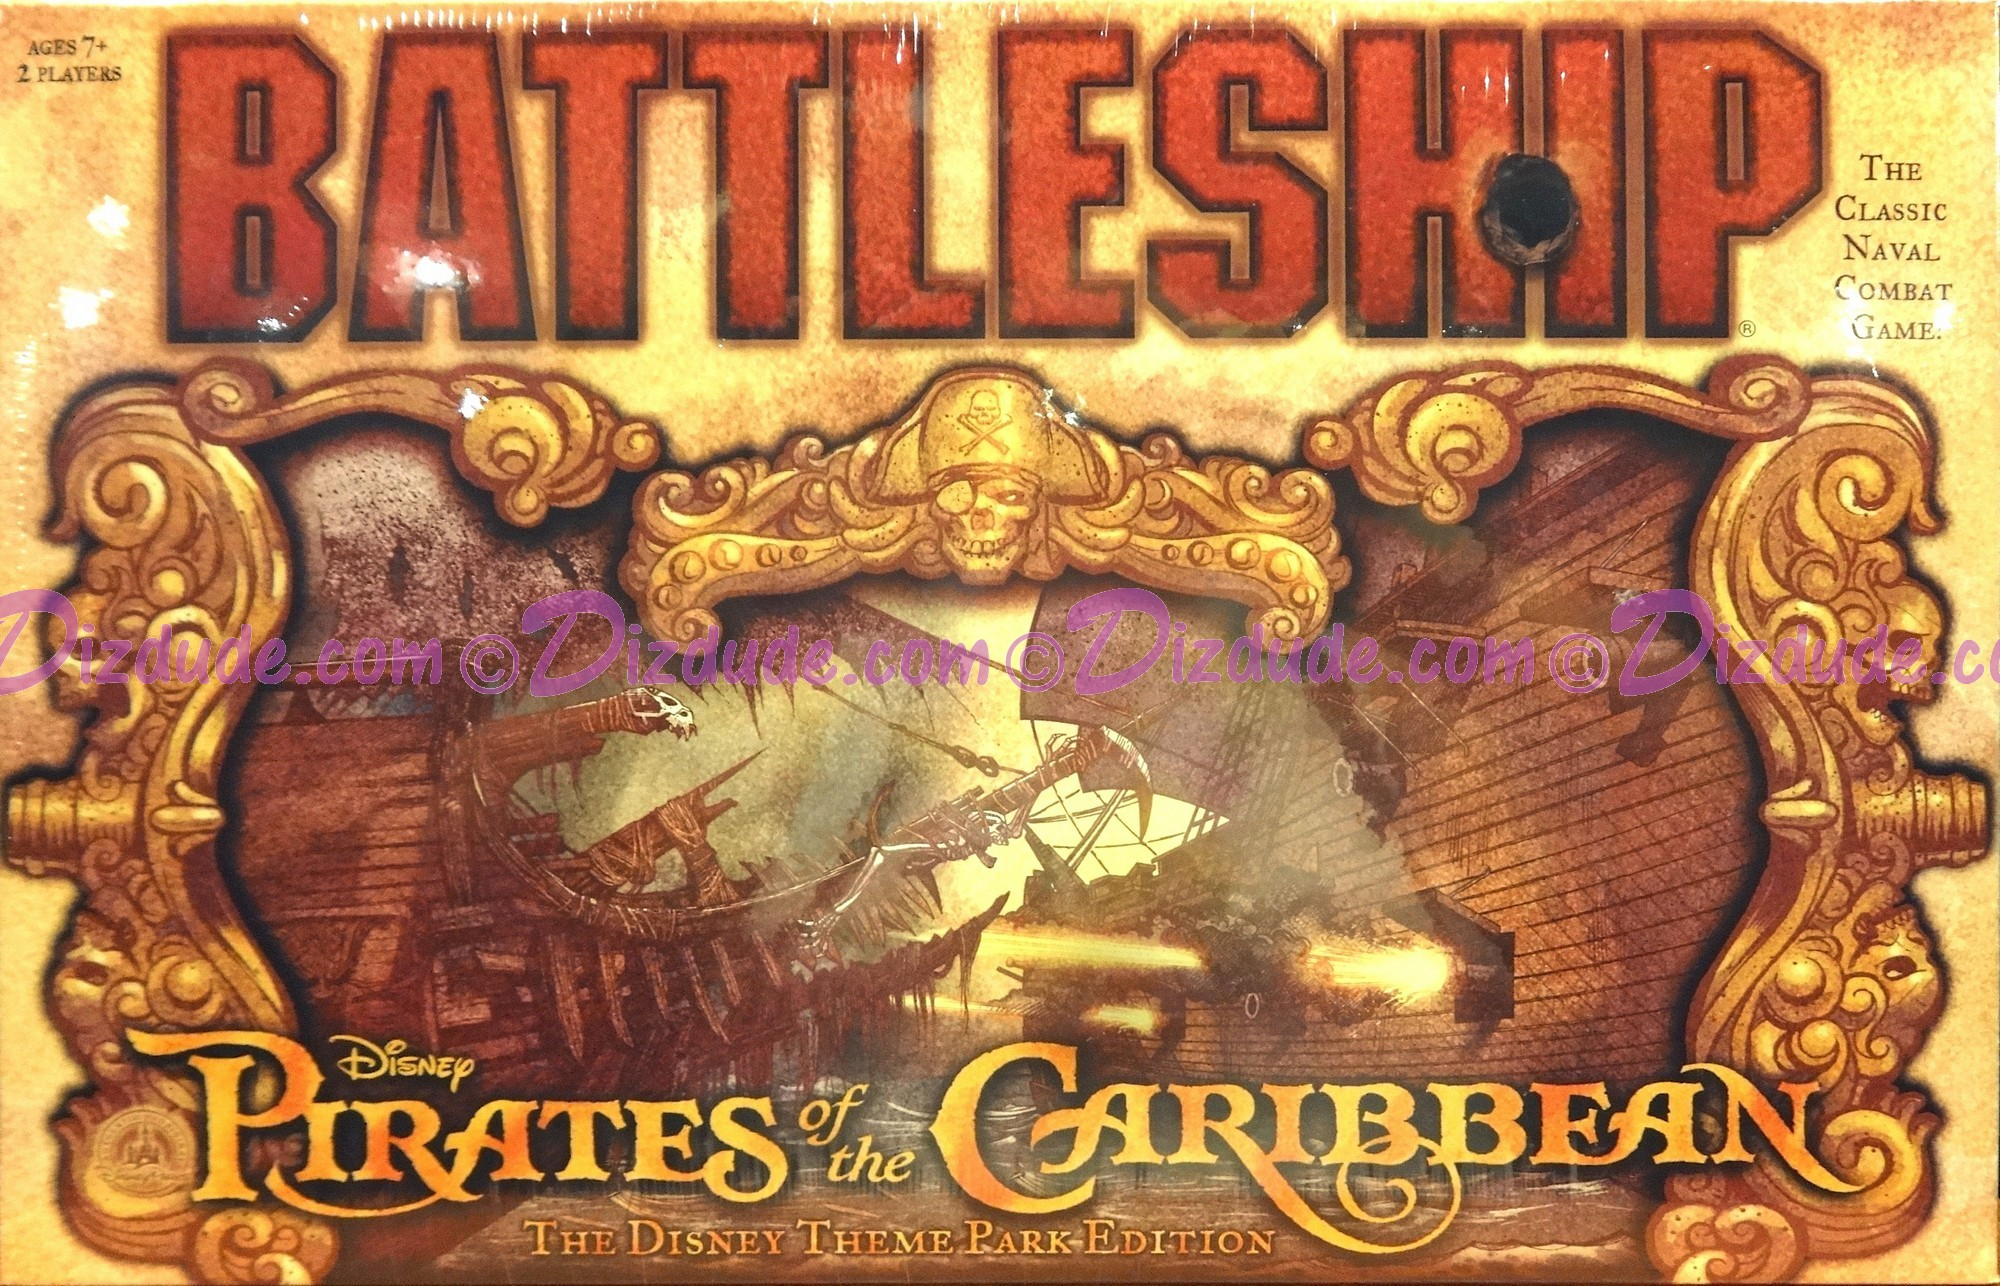 Pirates of the Caribbean BATTLESHIP - Disney Exclusive Theme Park Edition © Dizdude.com